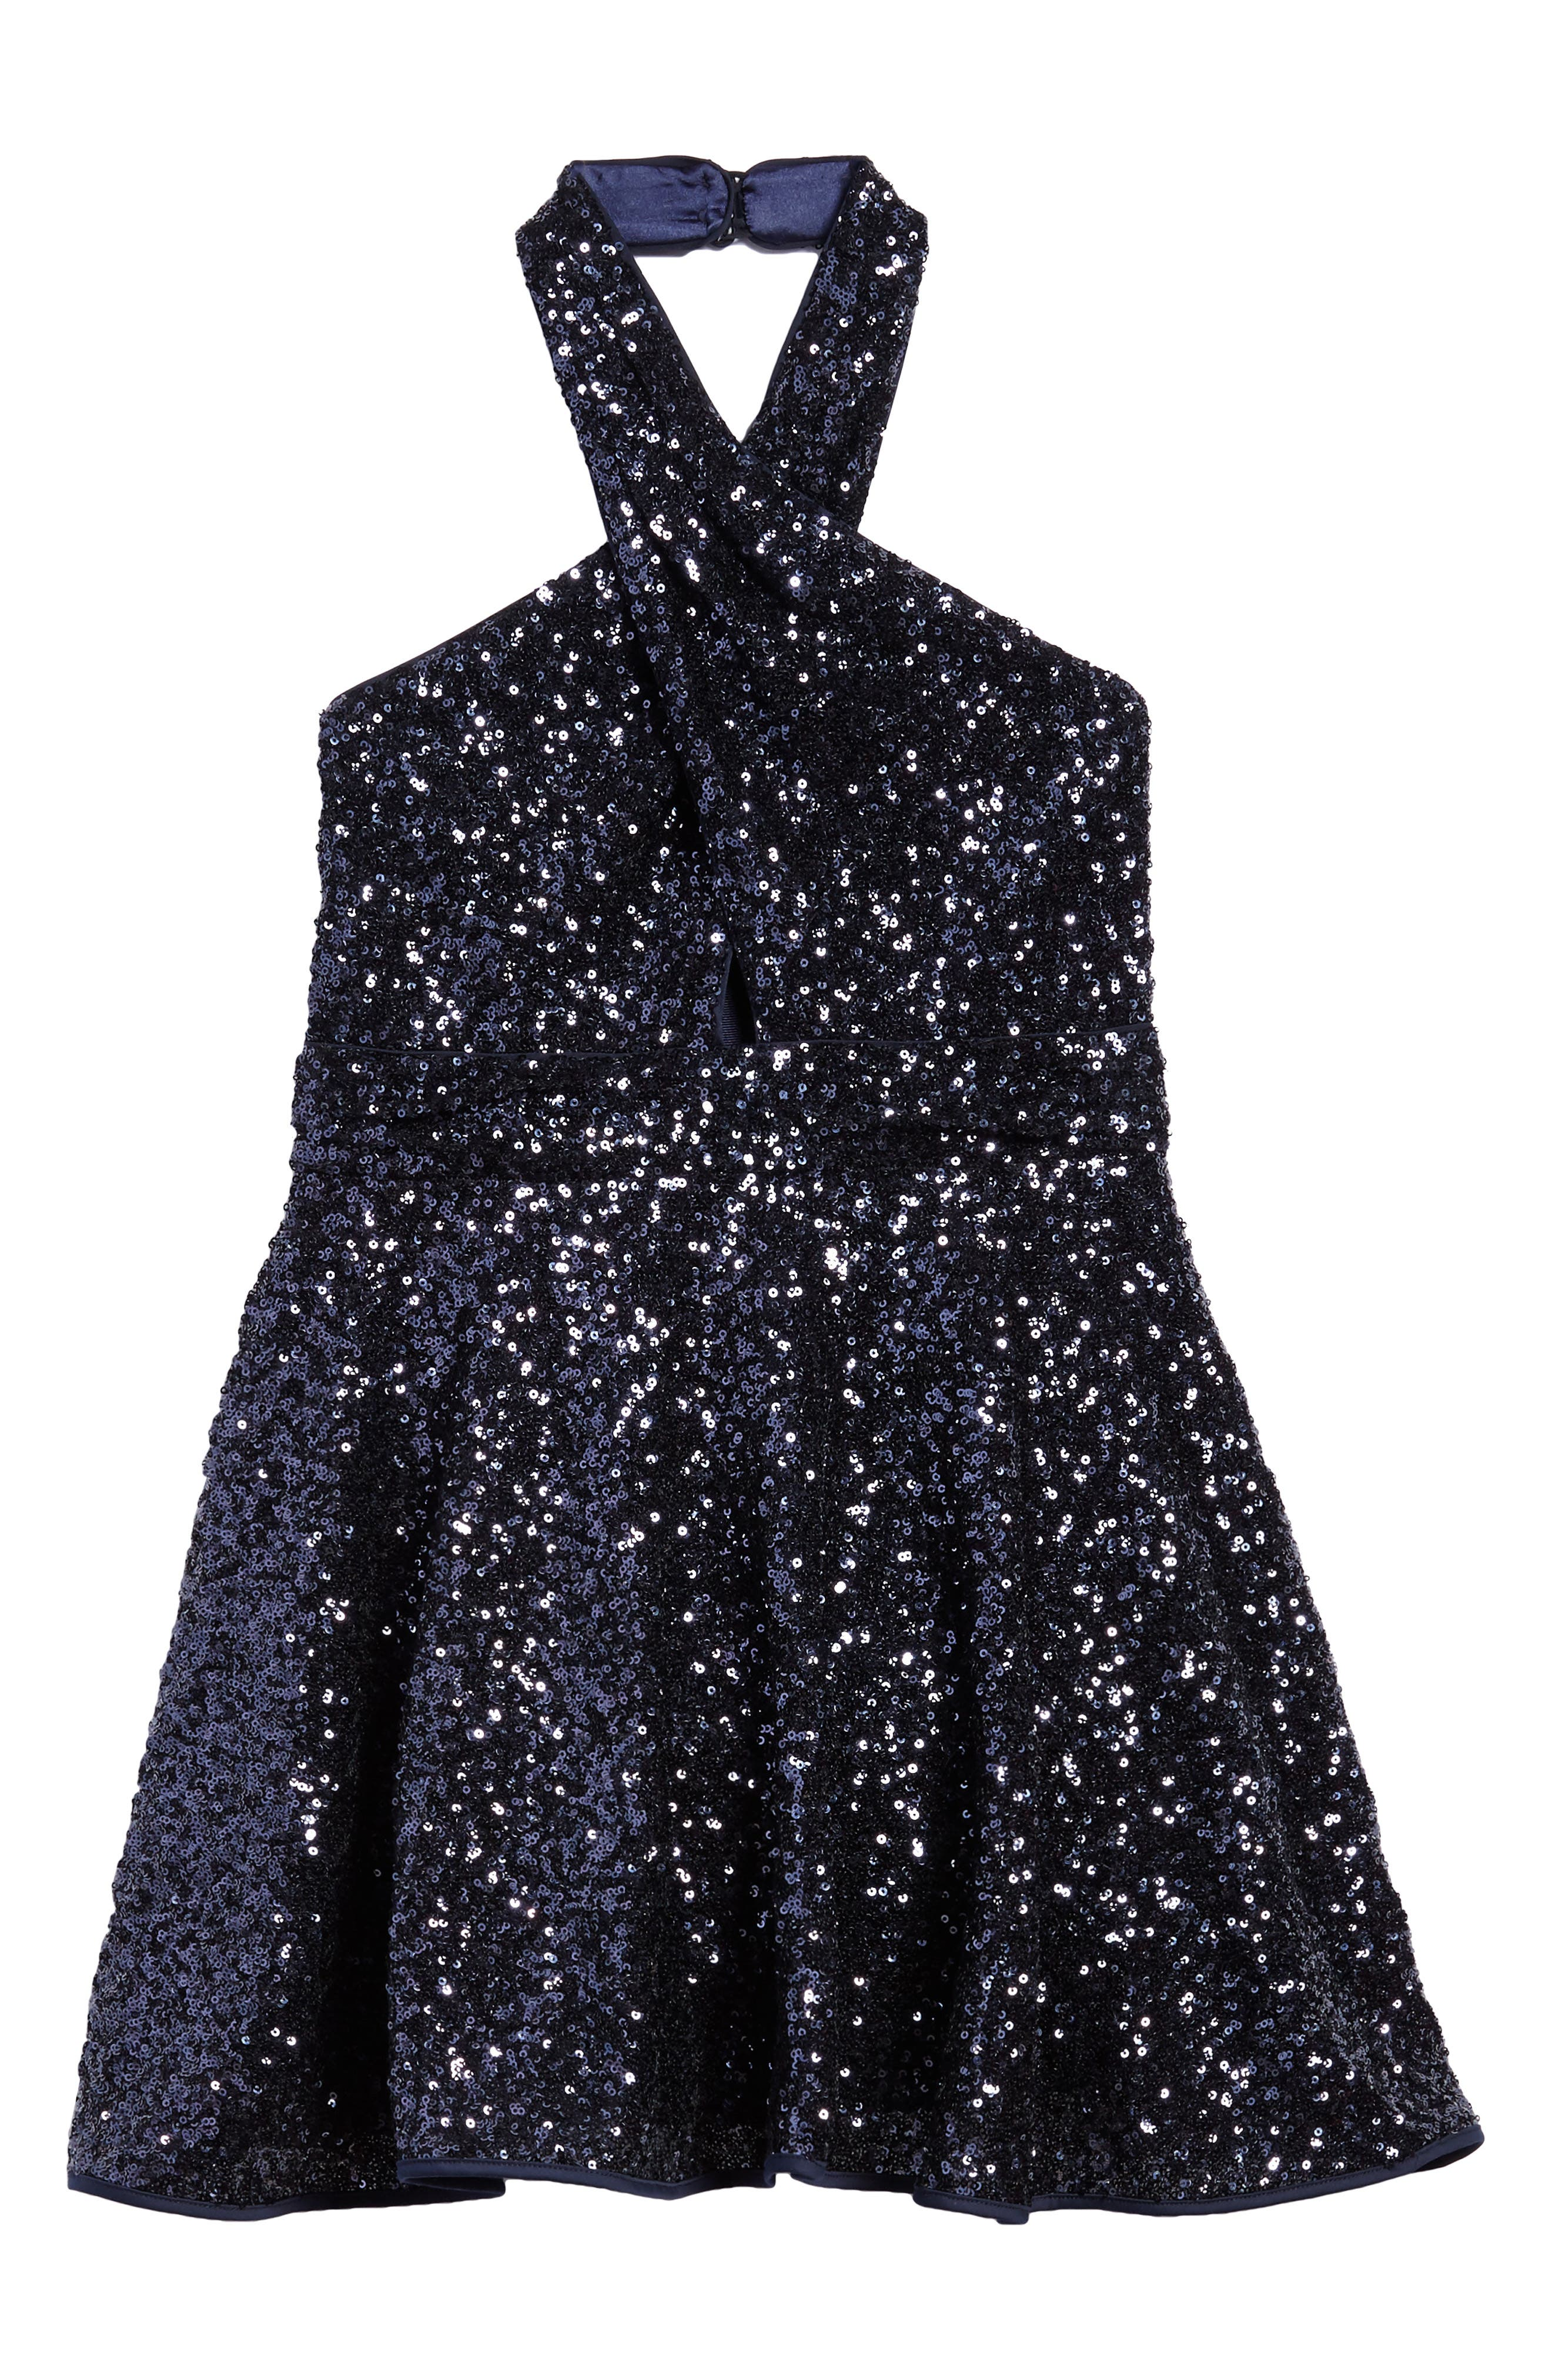 Sydney Sequin Halter Dress,                         Main,                         color, Navy